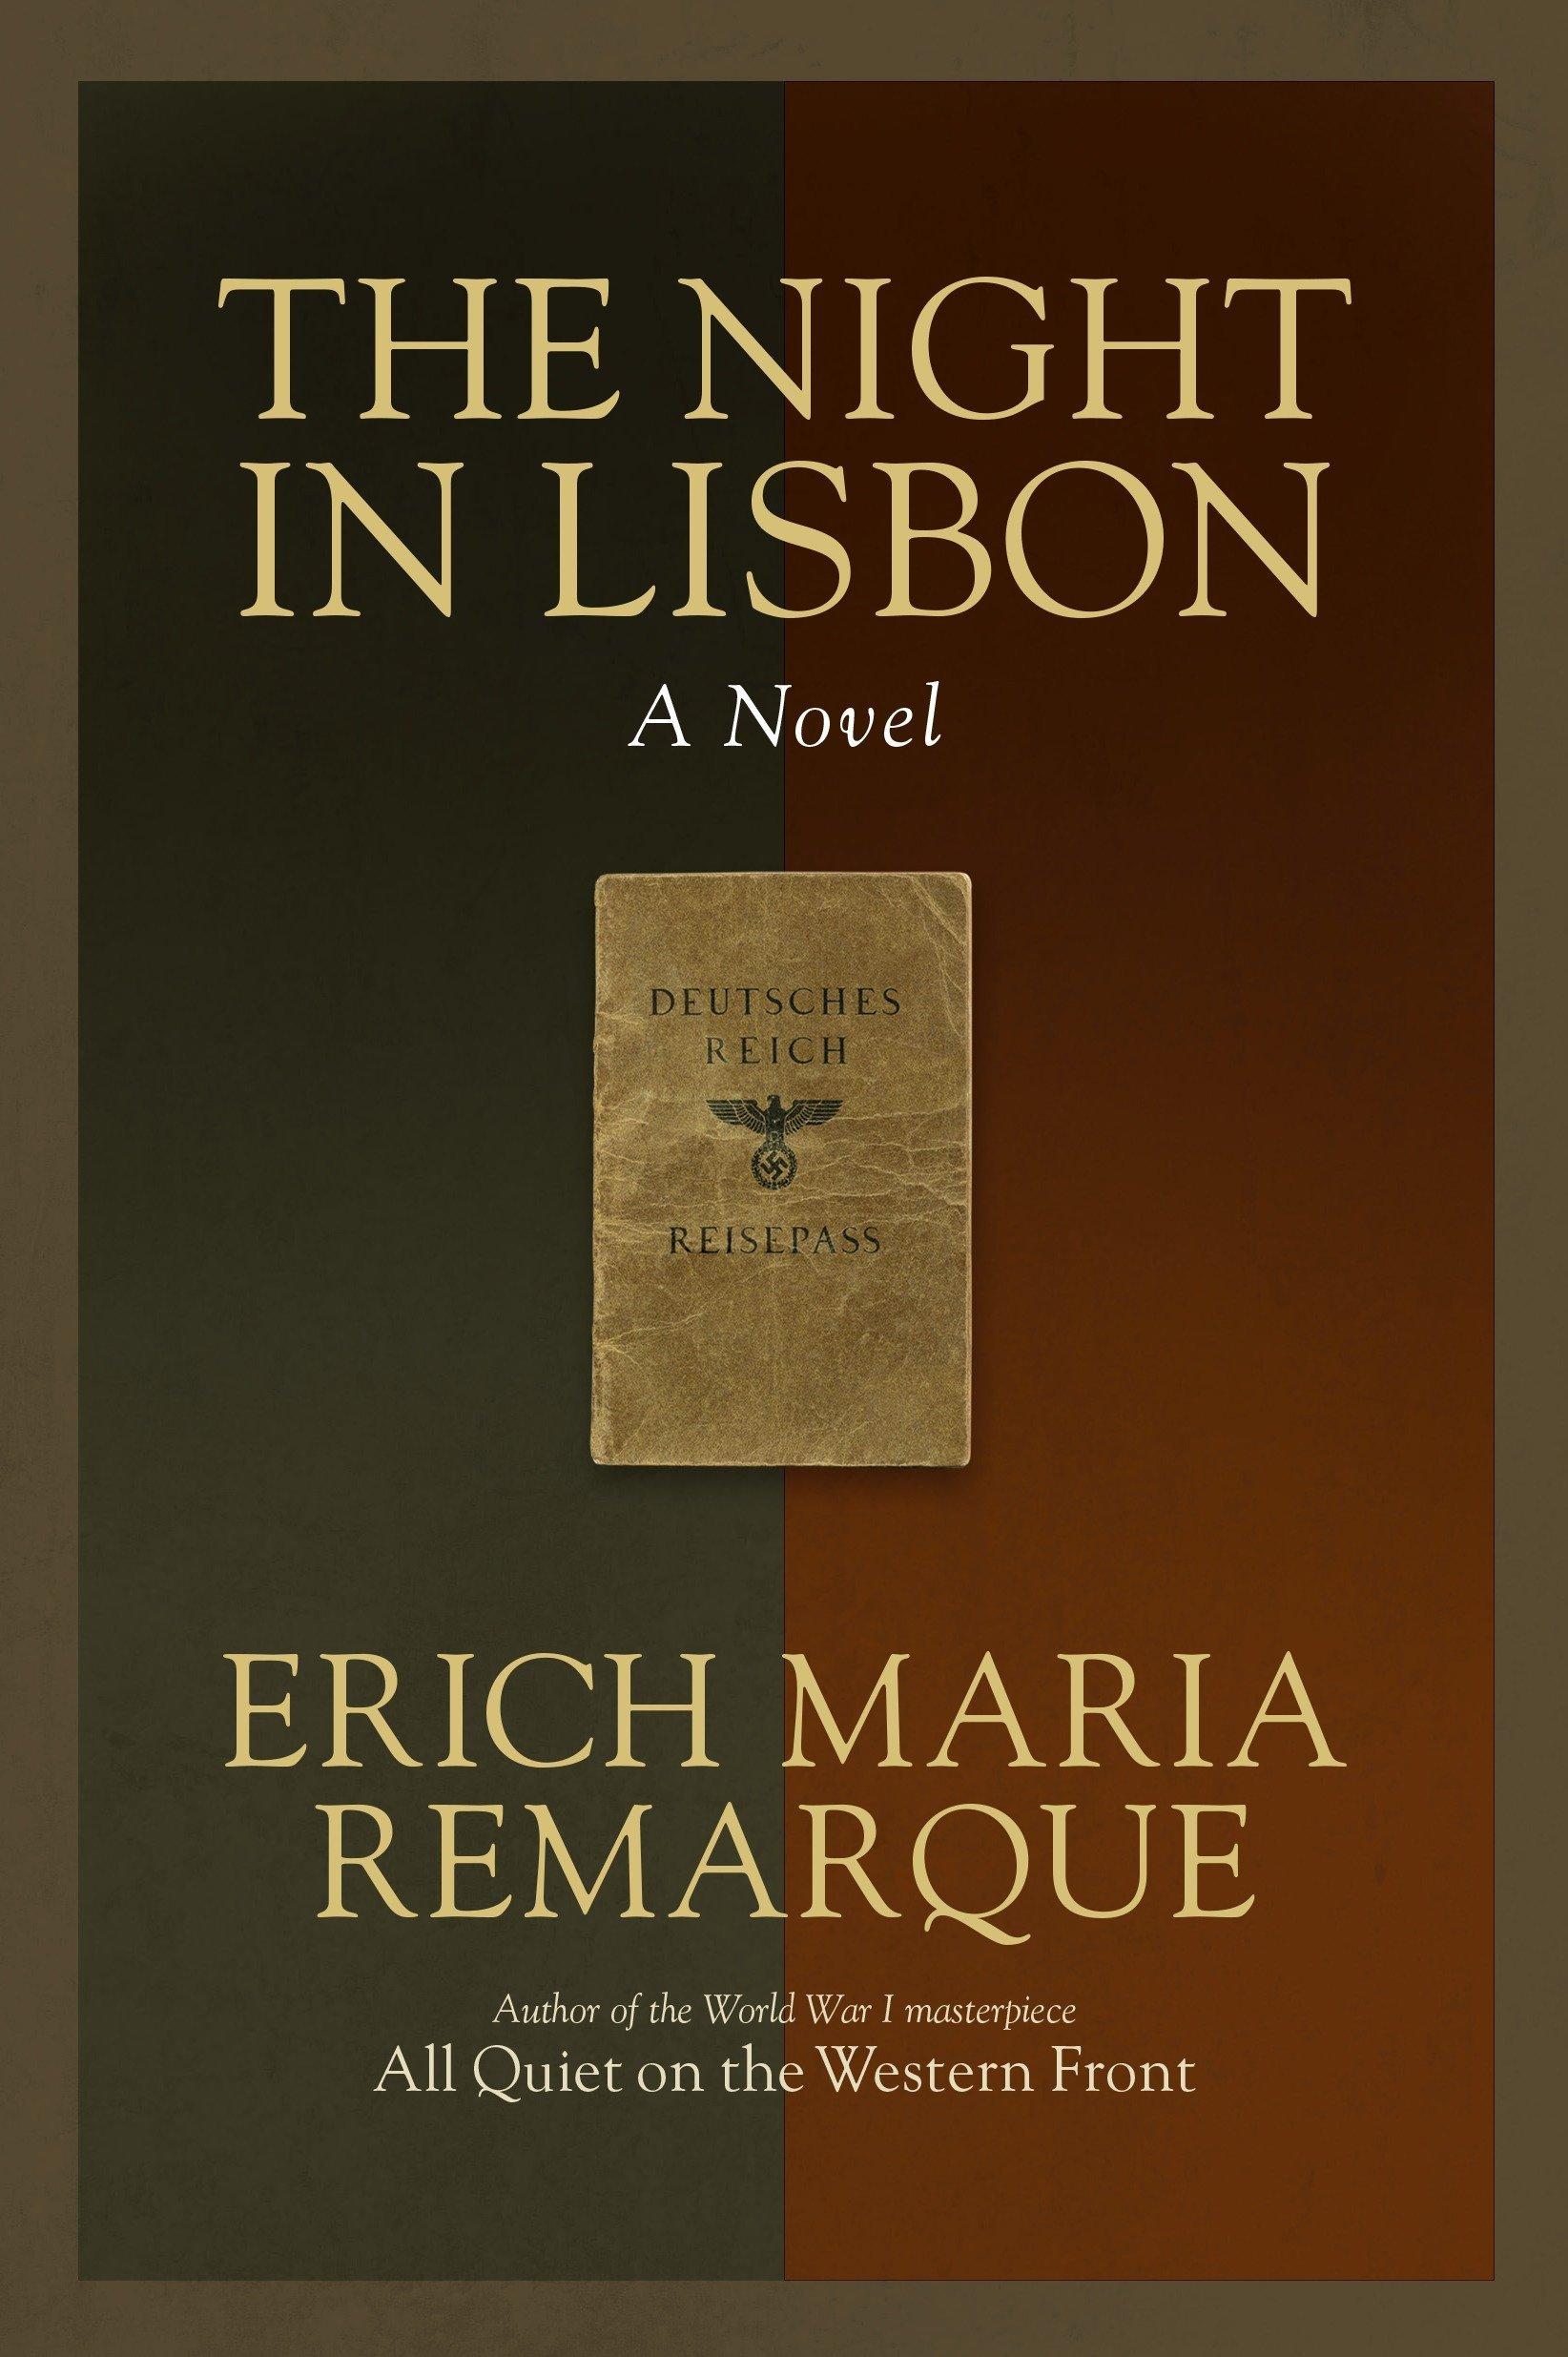 Erich Maria Remarque, Arc de Triomphe: a summary 61